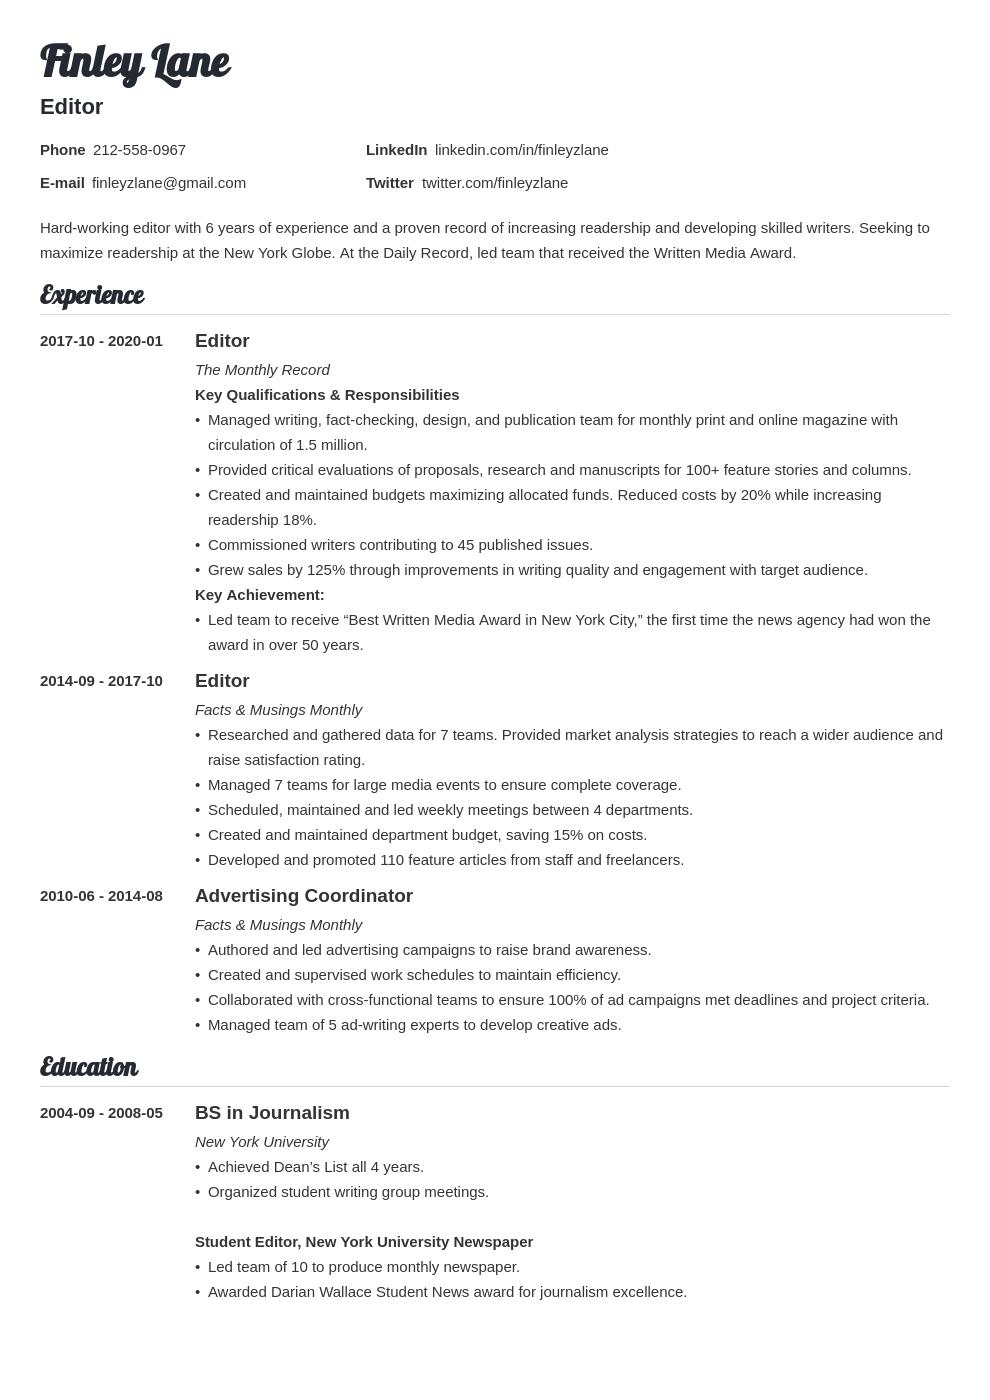 Editor Resume Example Template Valera Resume Examples Guided Writing Resume